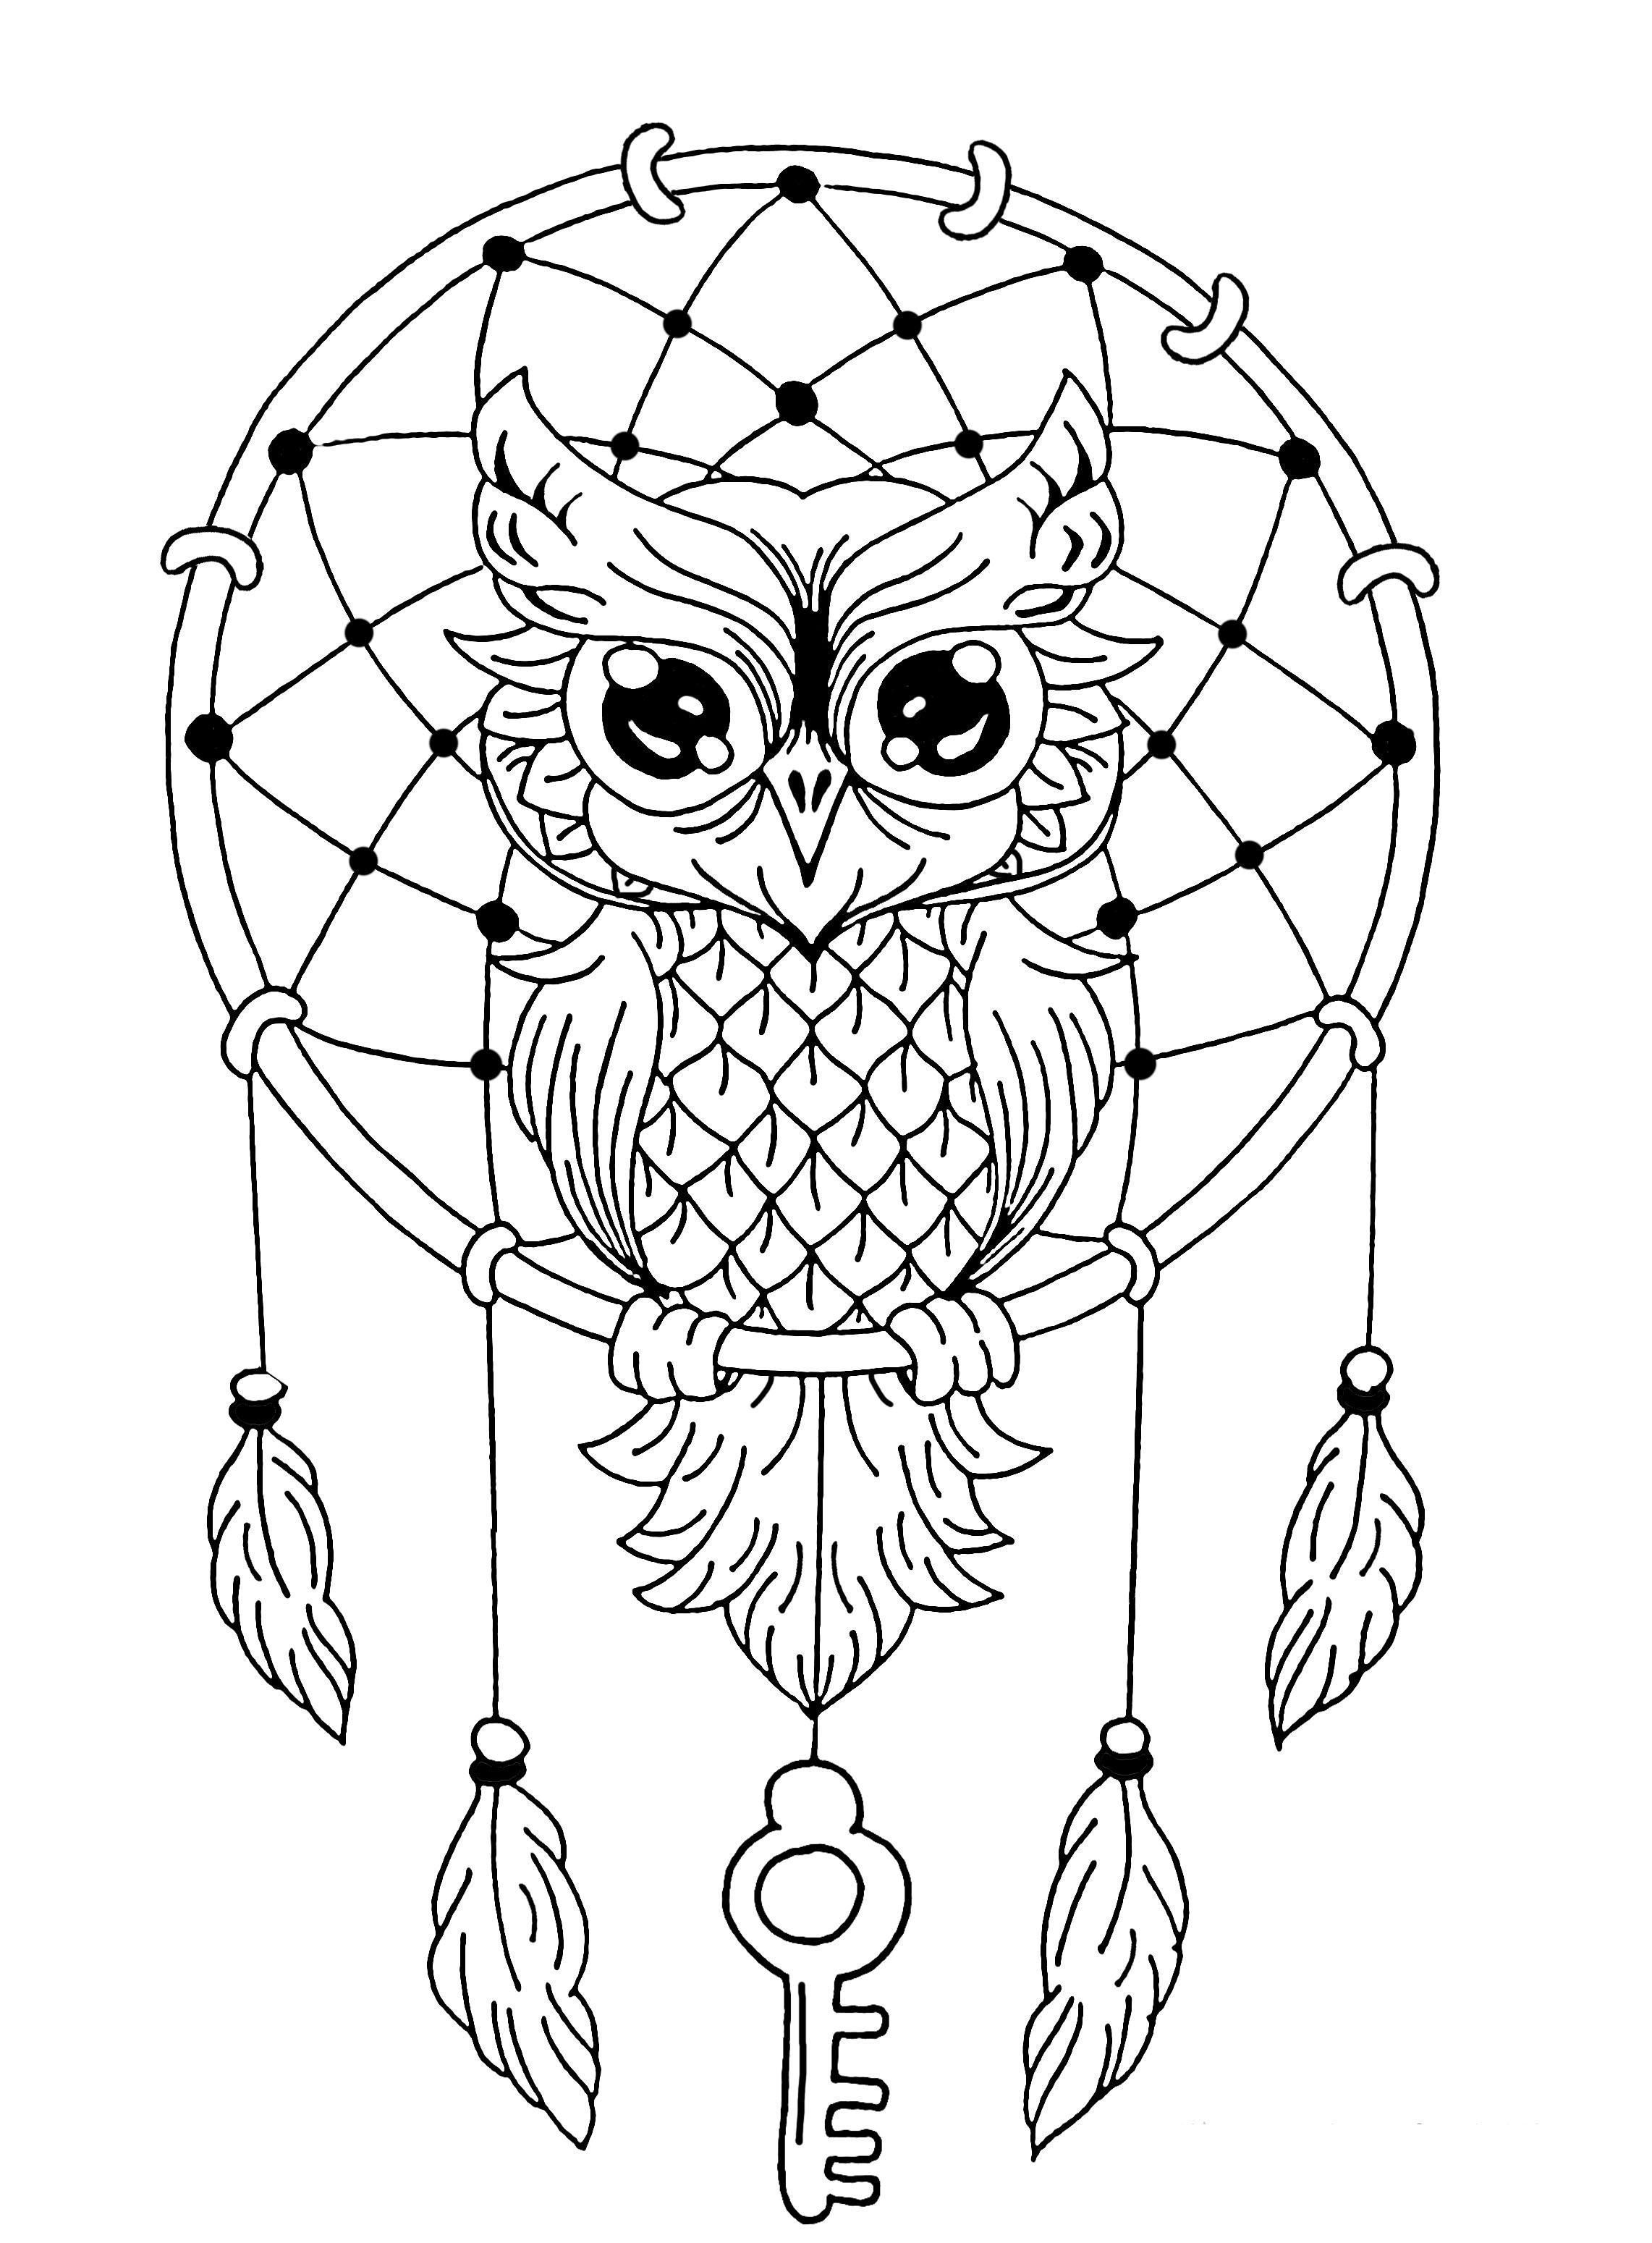 Coloriage Mandala Animaux Facile A Imprimer.Coloriage Mandala Animaux A Imprimer Gratuit Mandala Dream